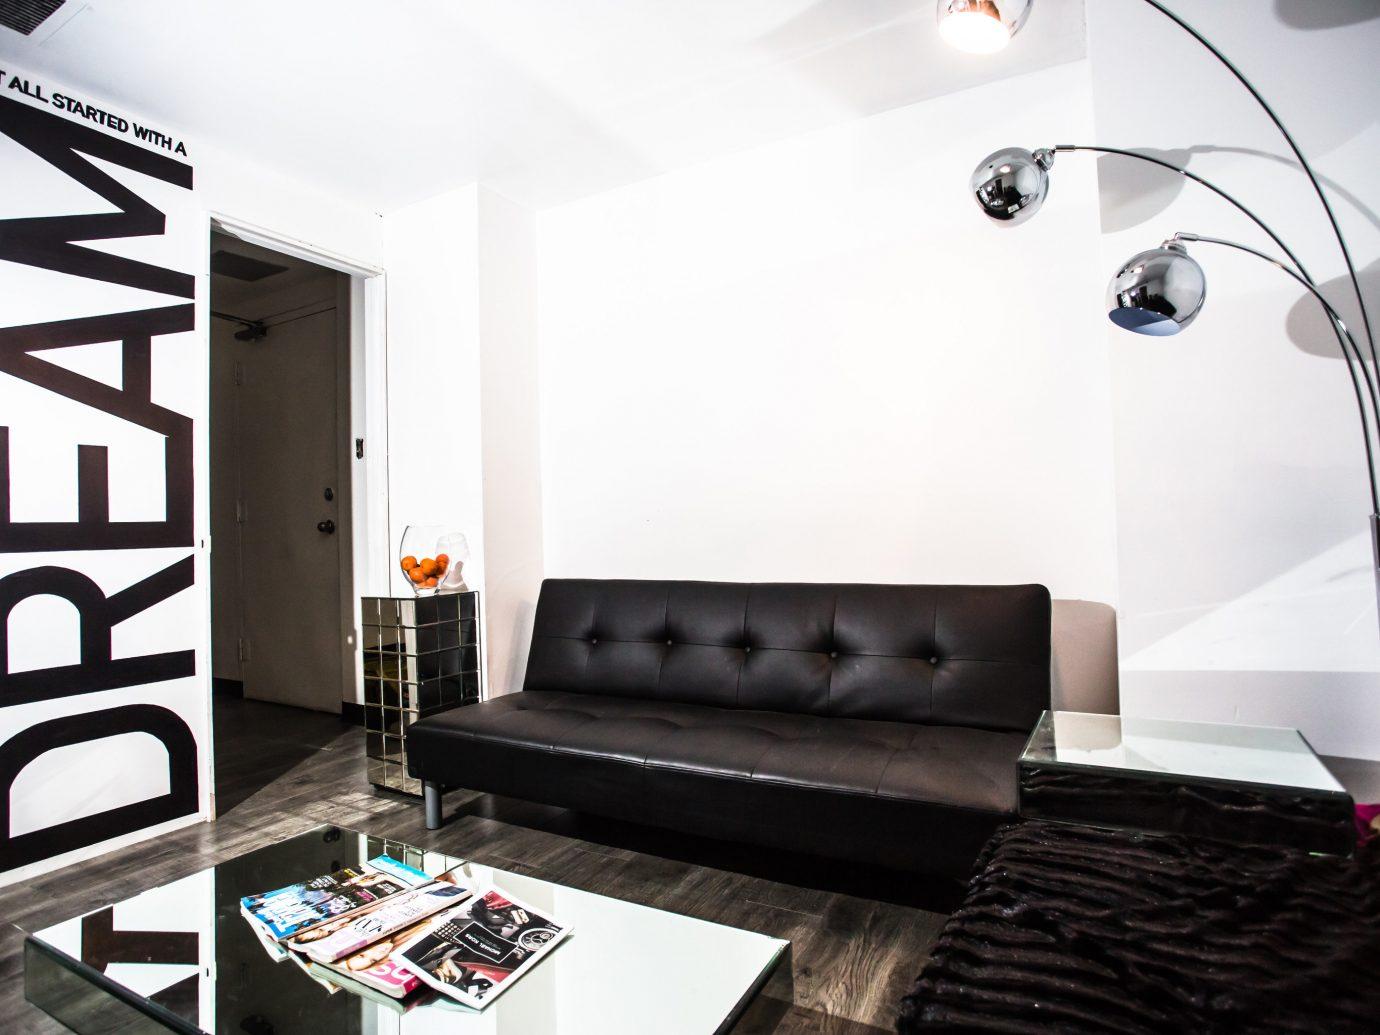 Style + Design indoor wall room property Living living room interior design home Design furniture cottage loft Suite apartment